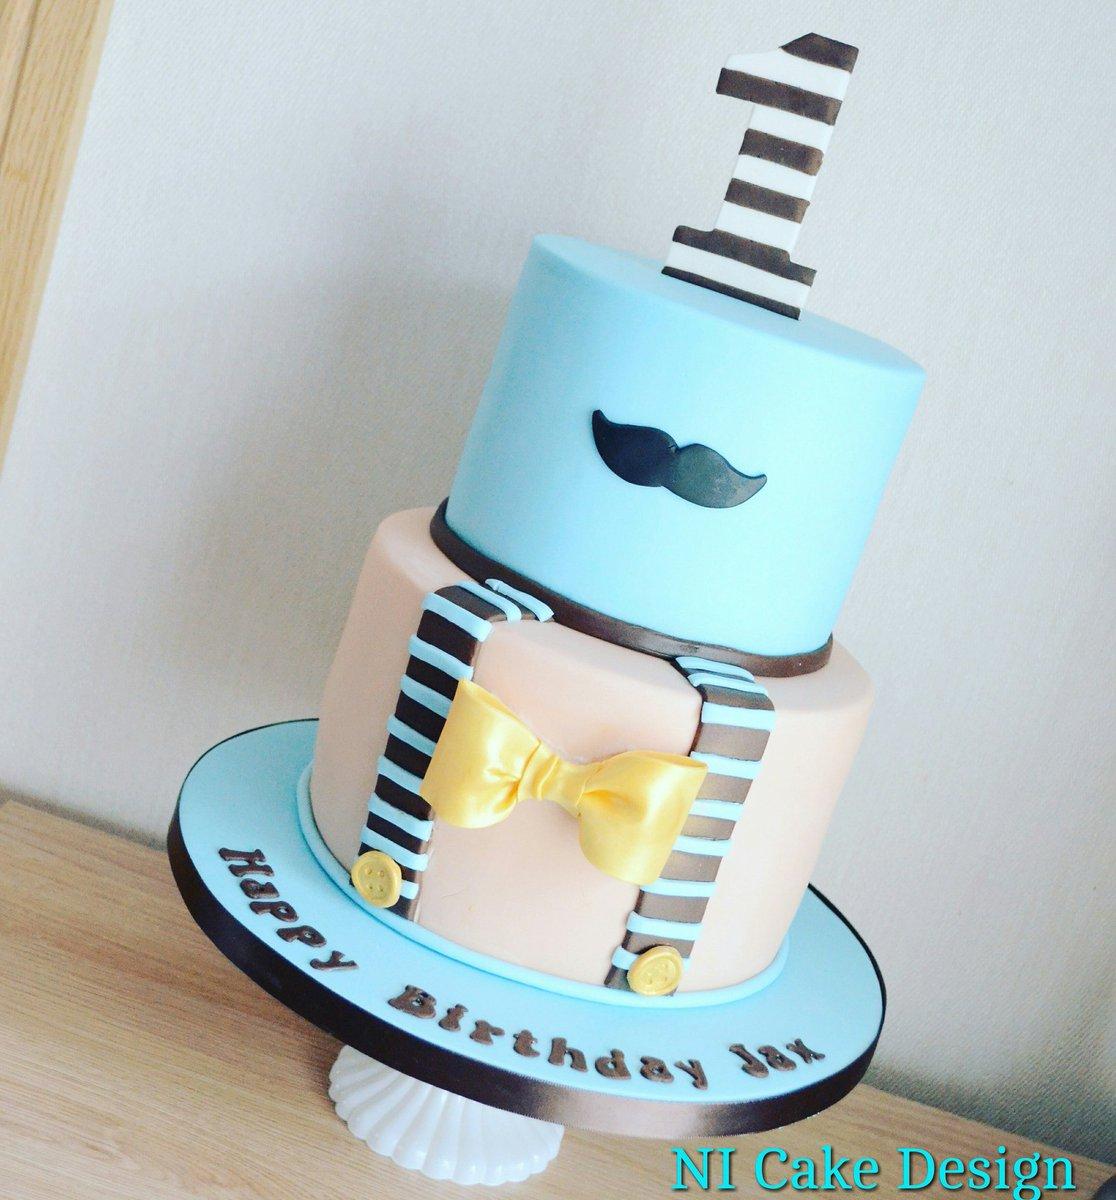 Ni Cake Design Cakesbylanda Twitter